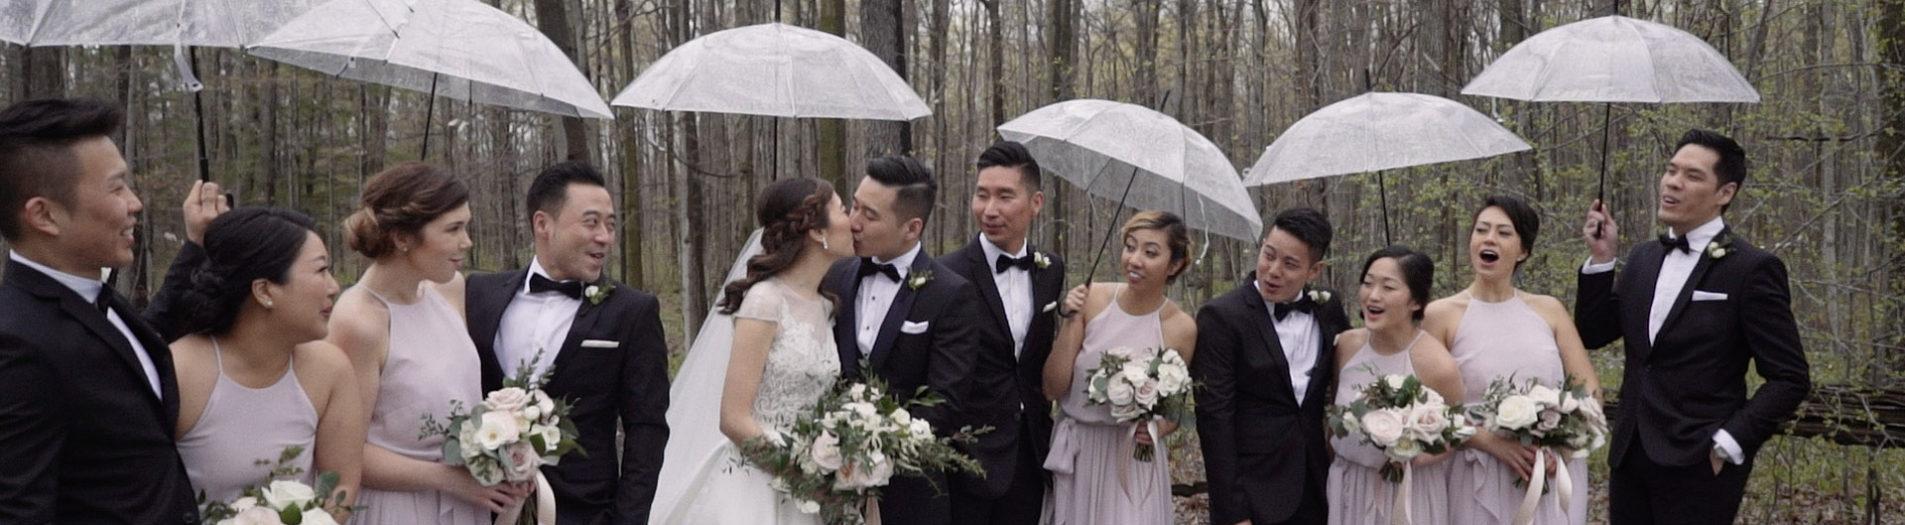 Linda + Daniel | Cinematic Wedding Film | Whistle Bear Golf Club, Waterloo, Ontario